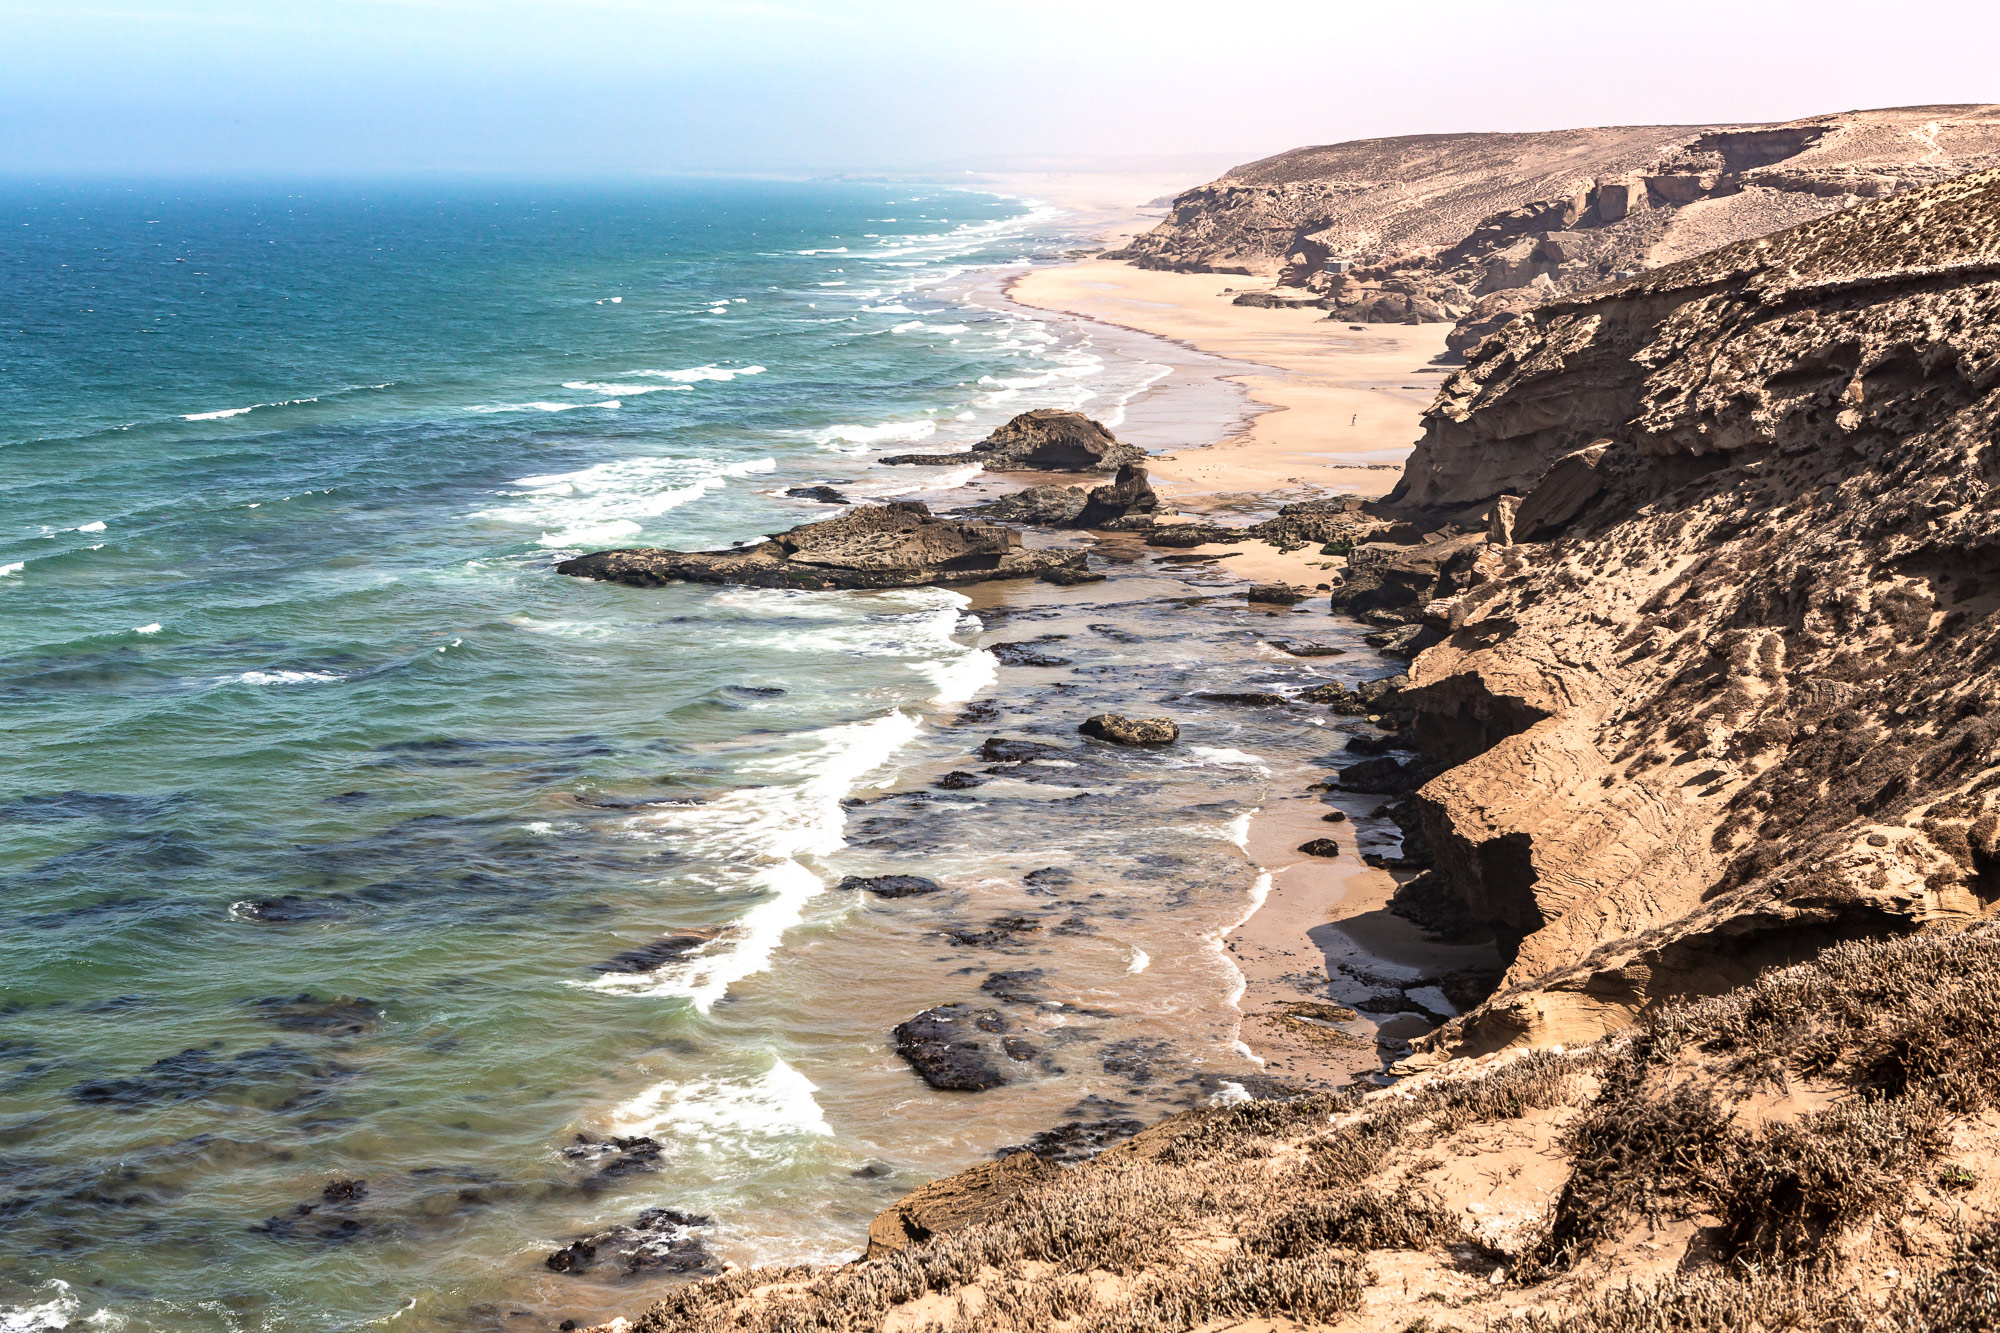 Trek au Maroc Agadir Essaouira plages